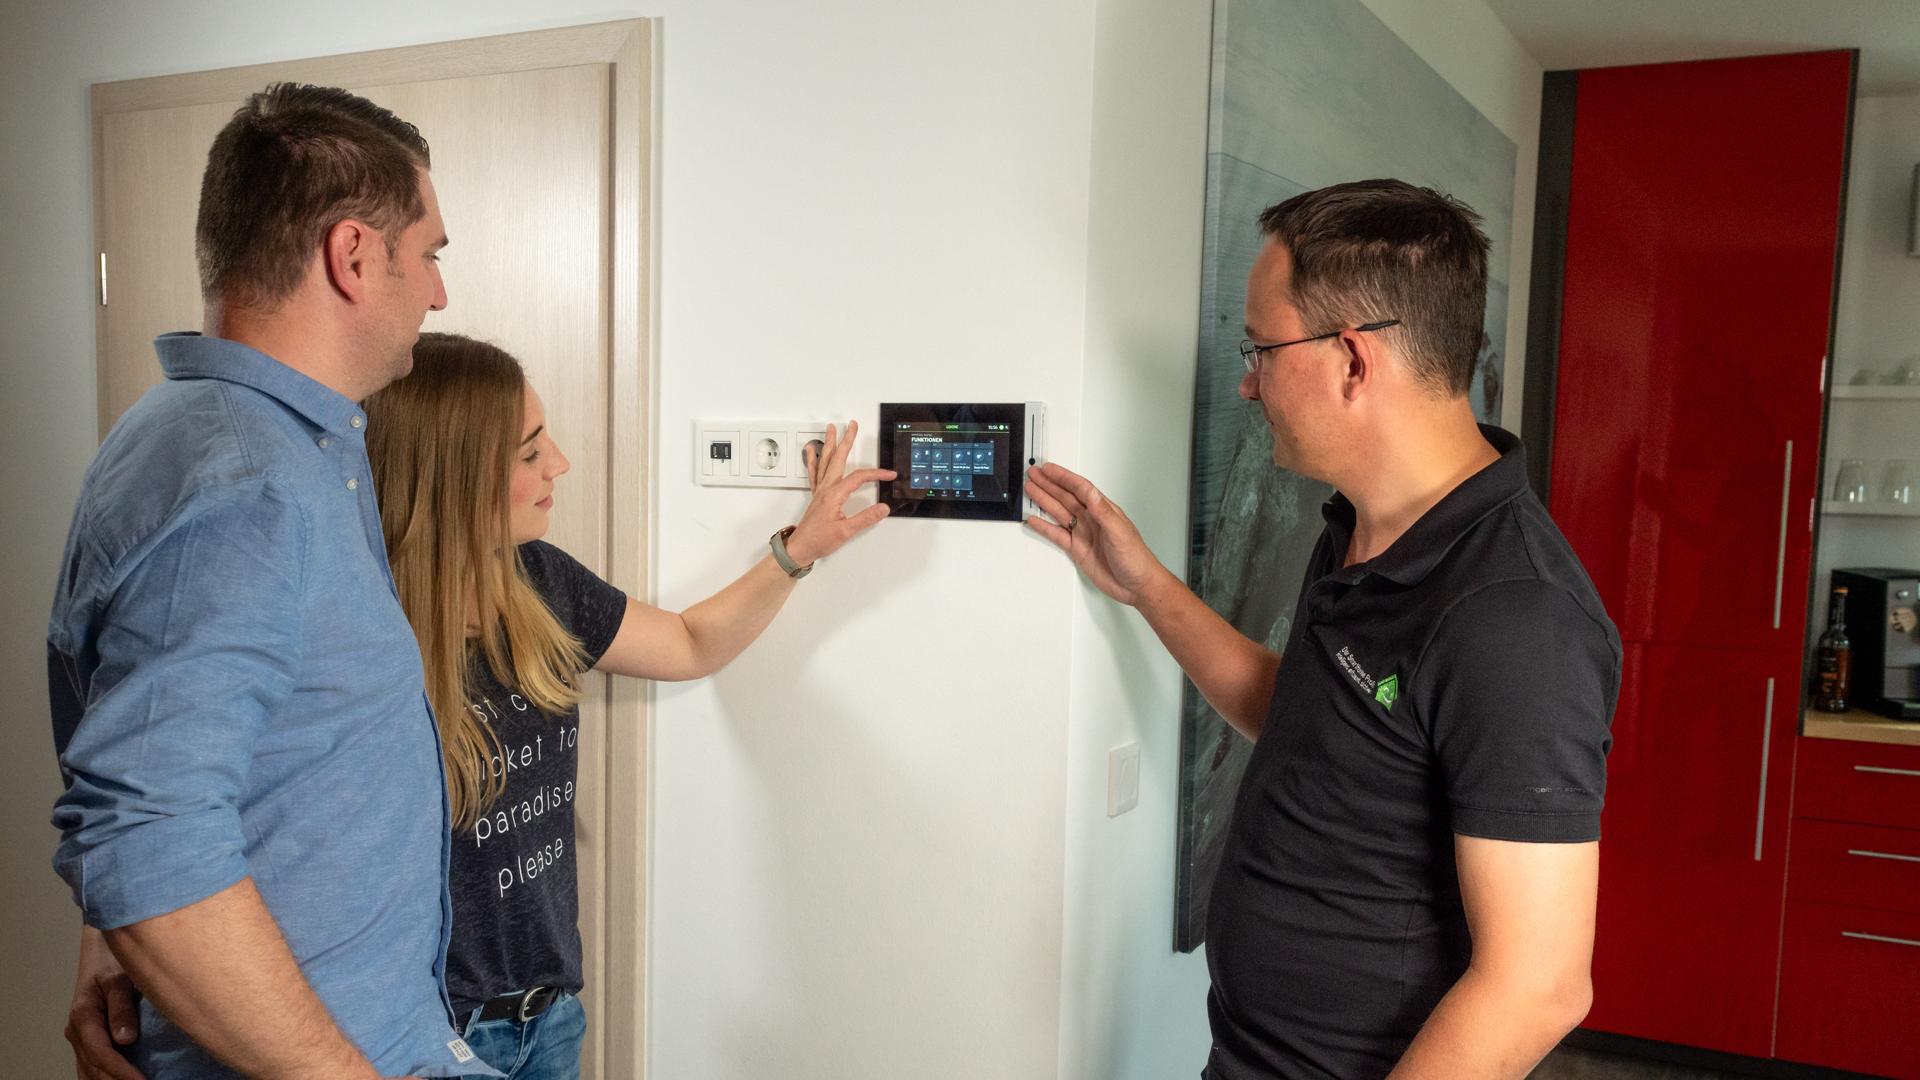 Loxone Partner using smart home app on tablet